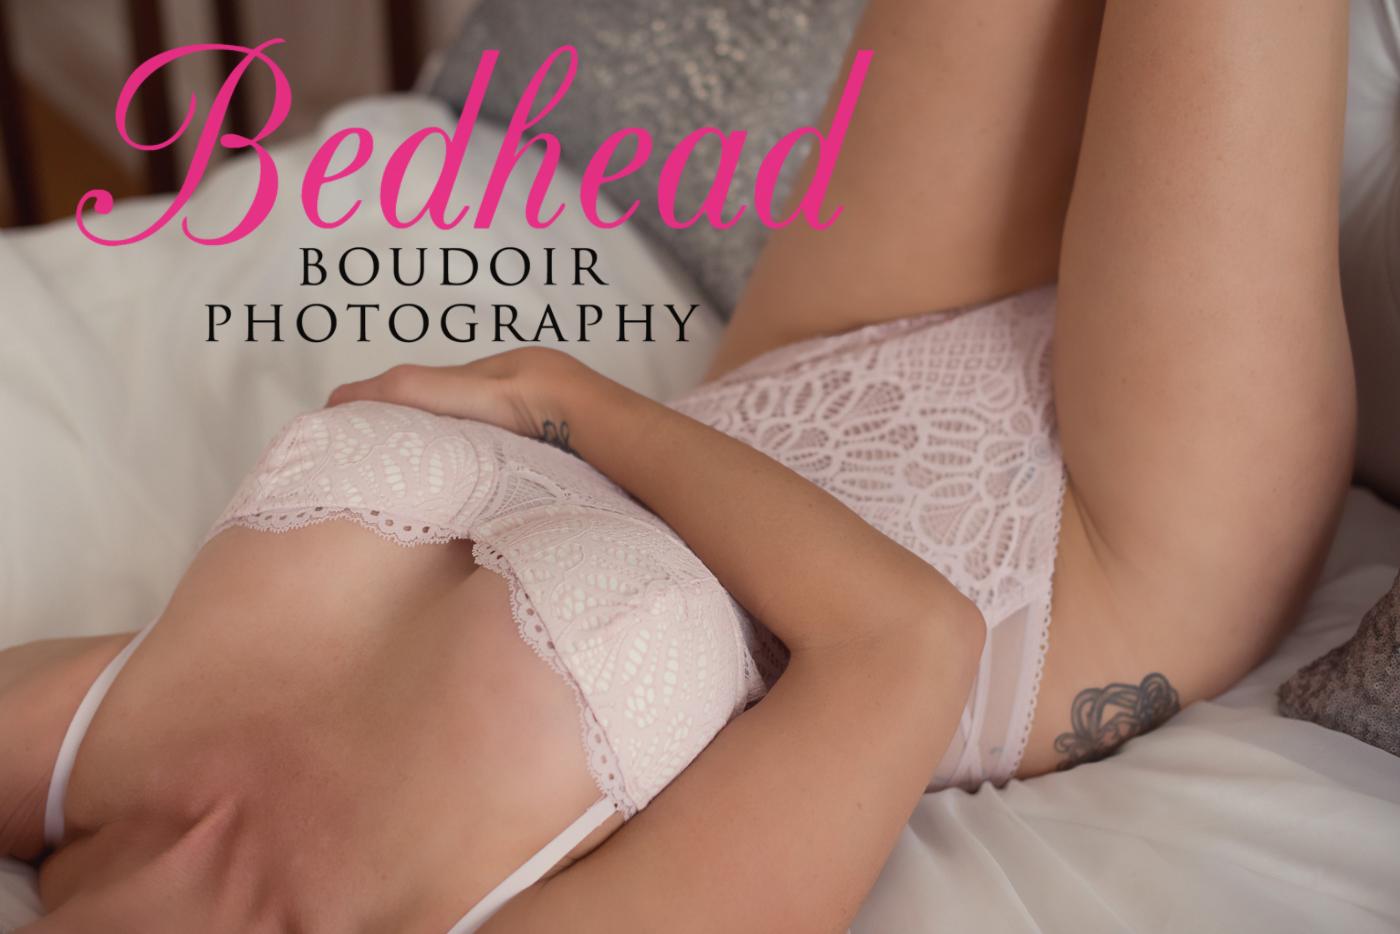 Bedhead_Boudoir_Photography_Chicago-13.jpg